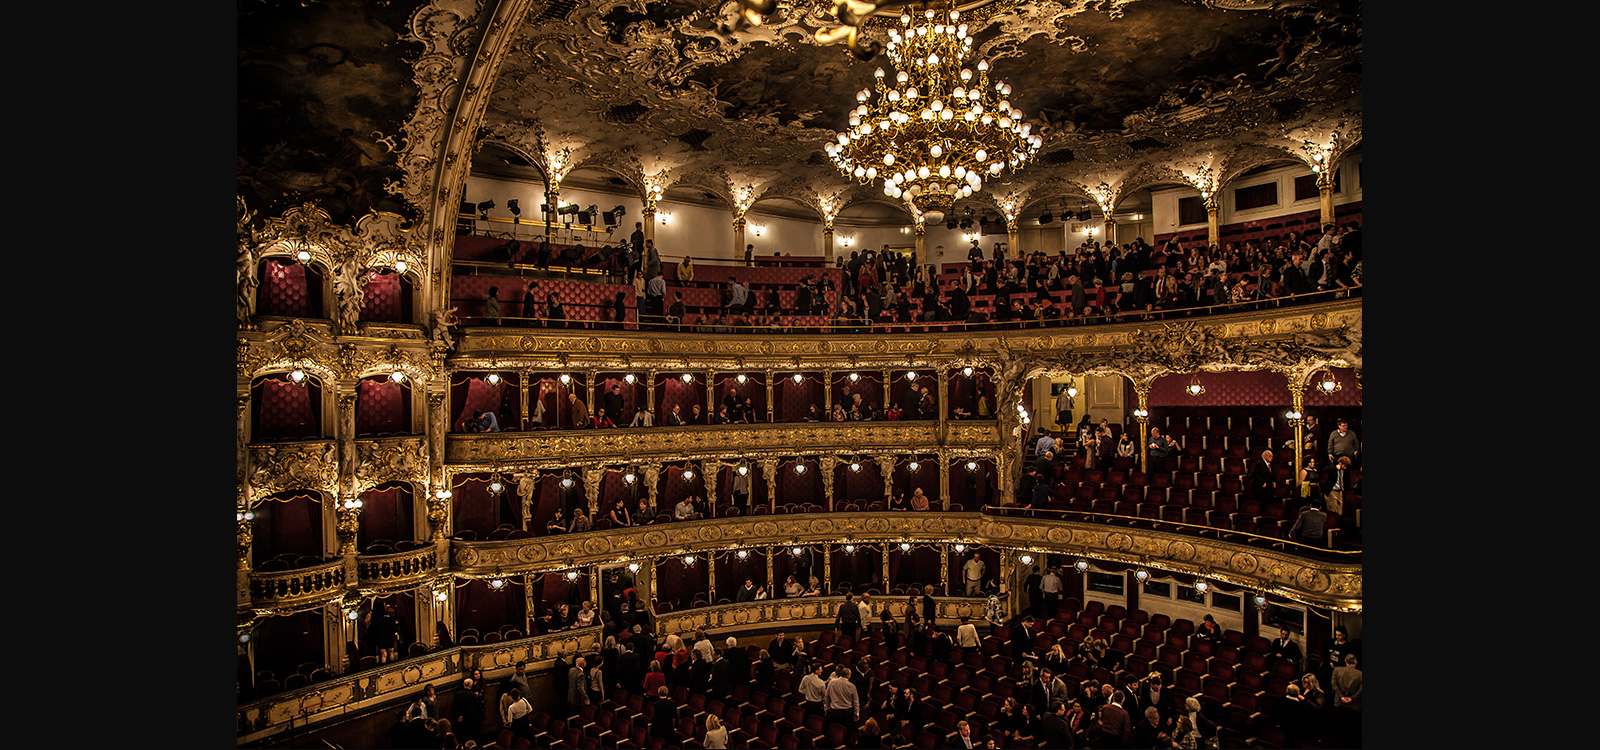 Teatro opera cultura musica lirica